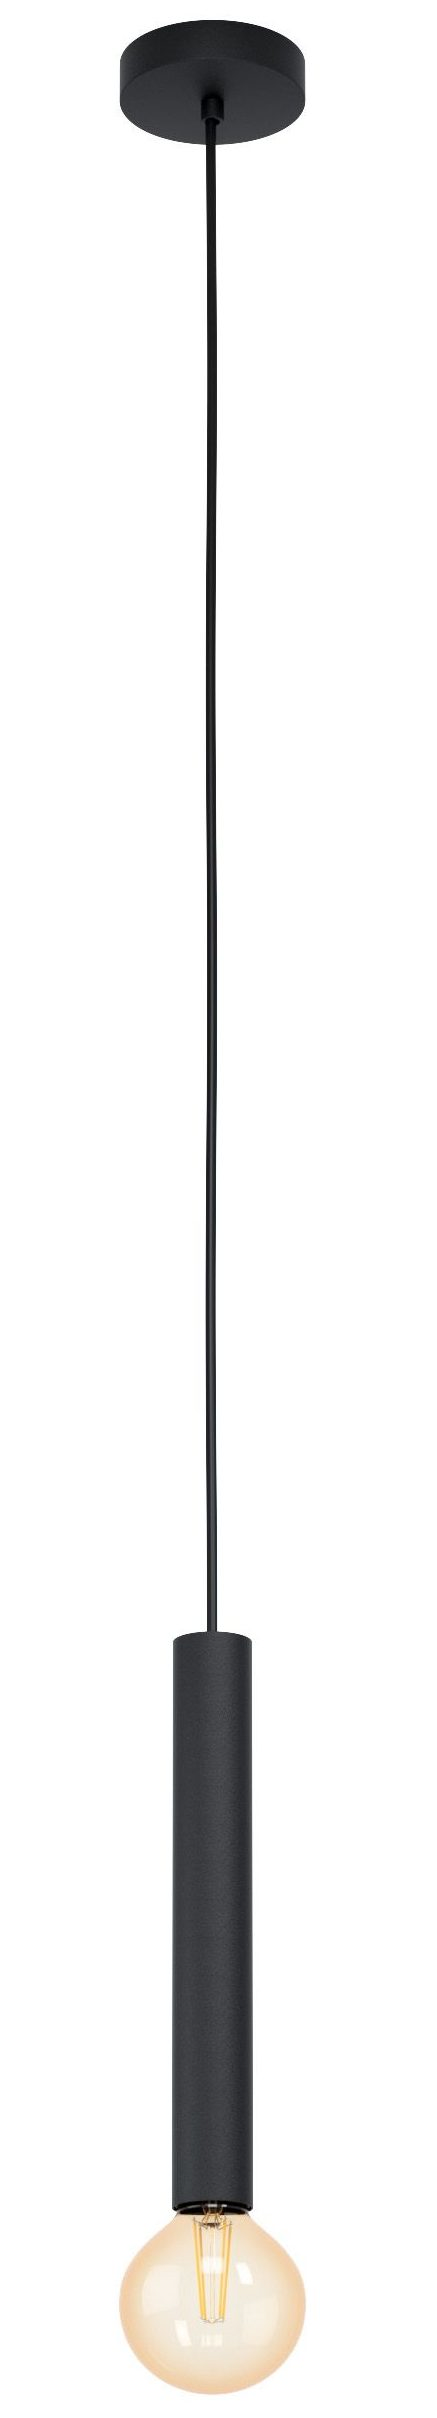 Hanglamp cortenova 1li e27 zwart - zwart Eglo Hanglamp 98056-EGLO